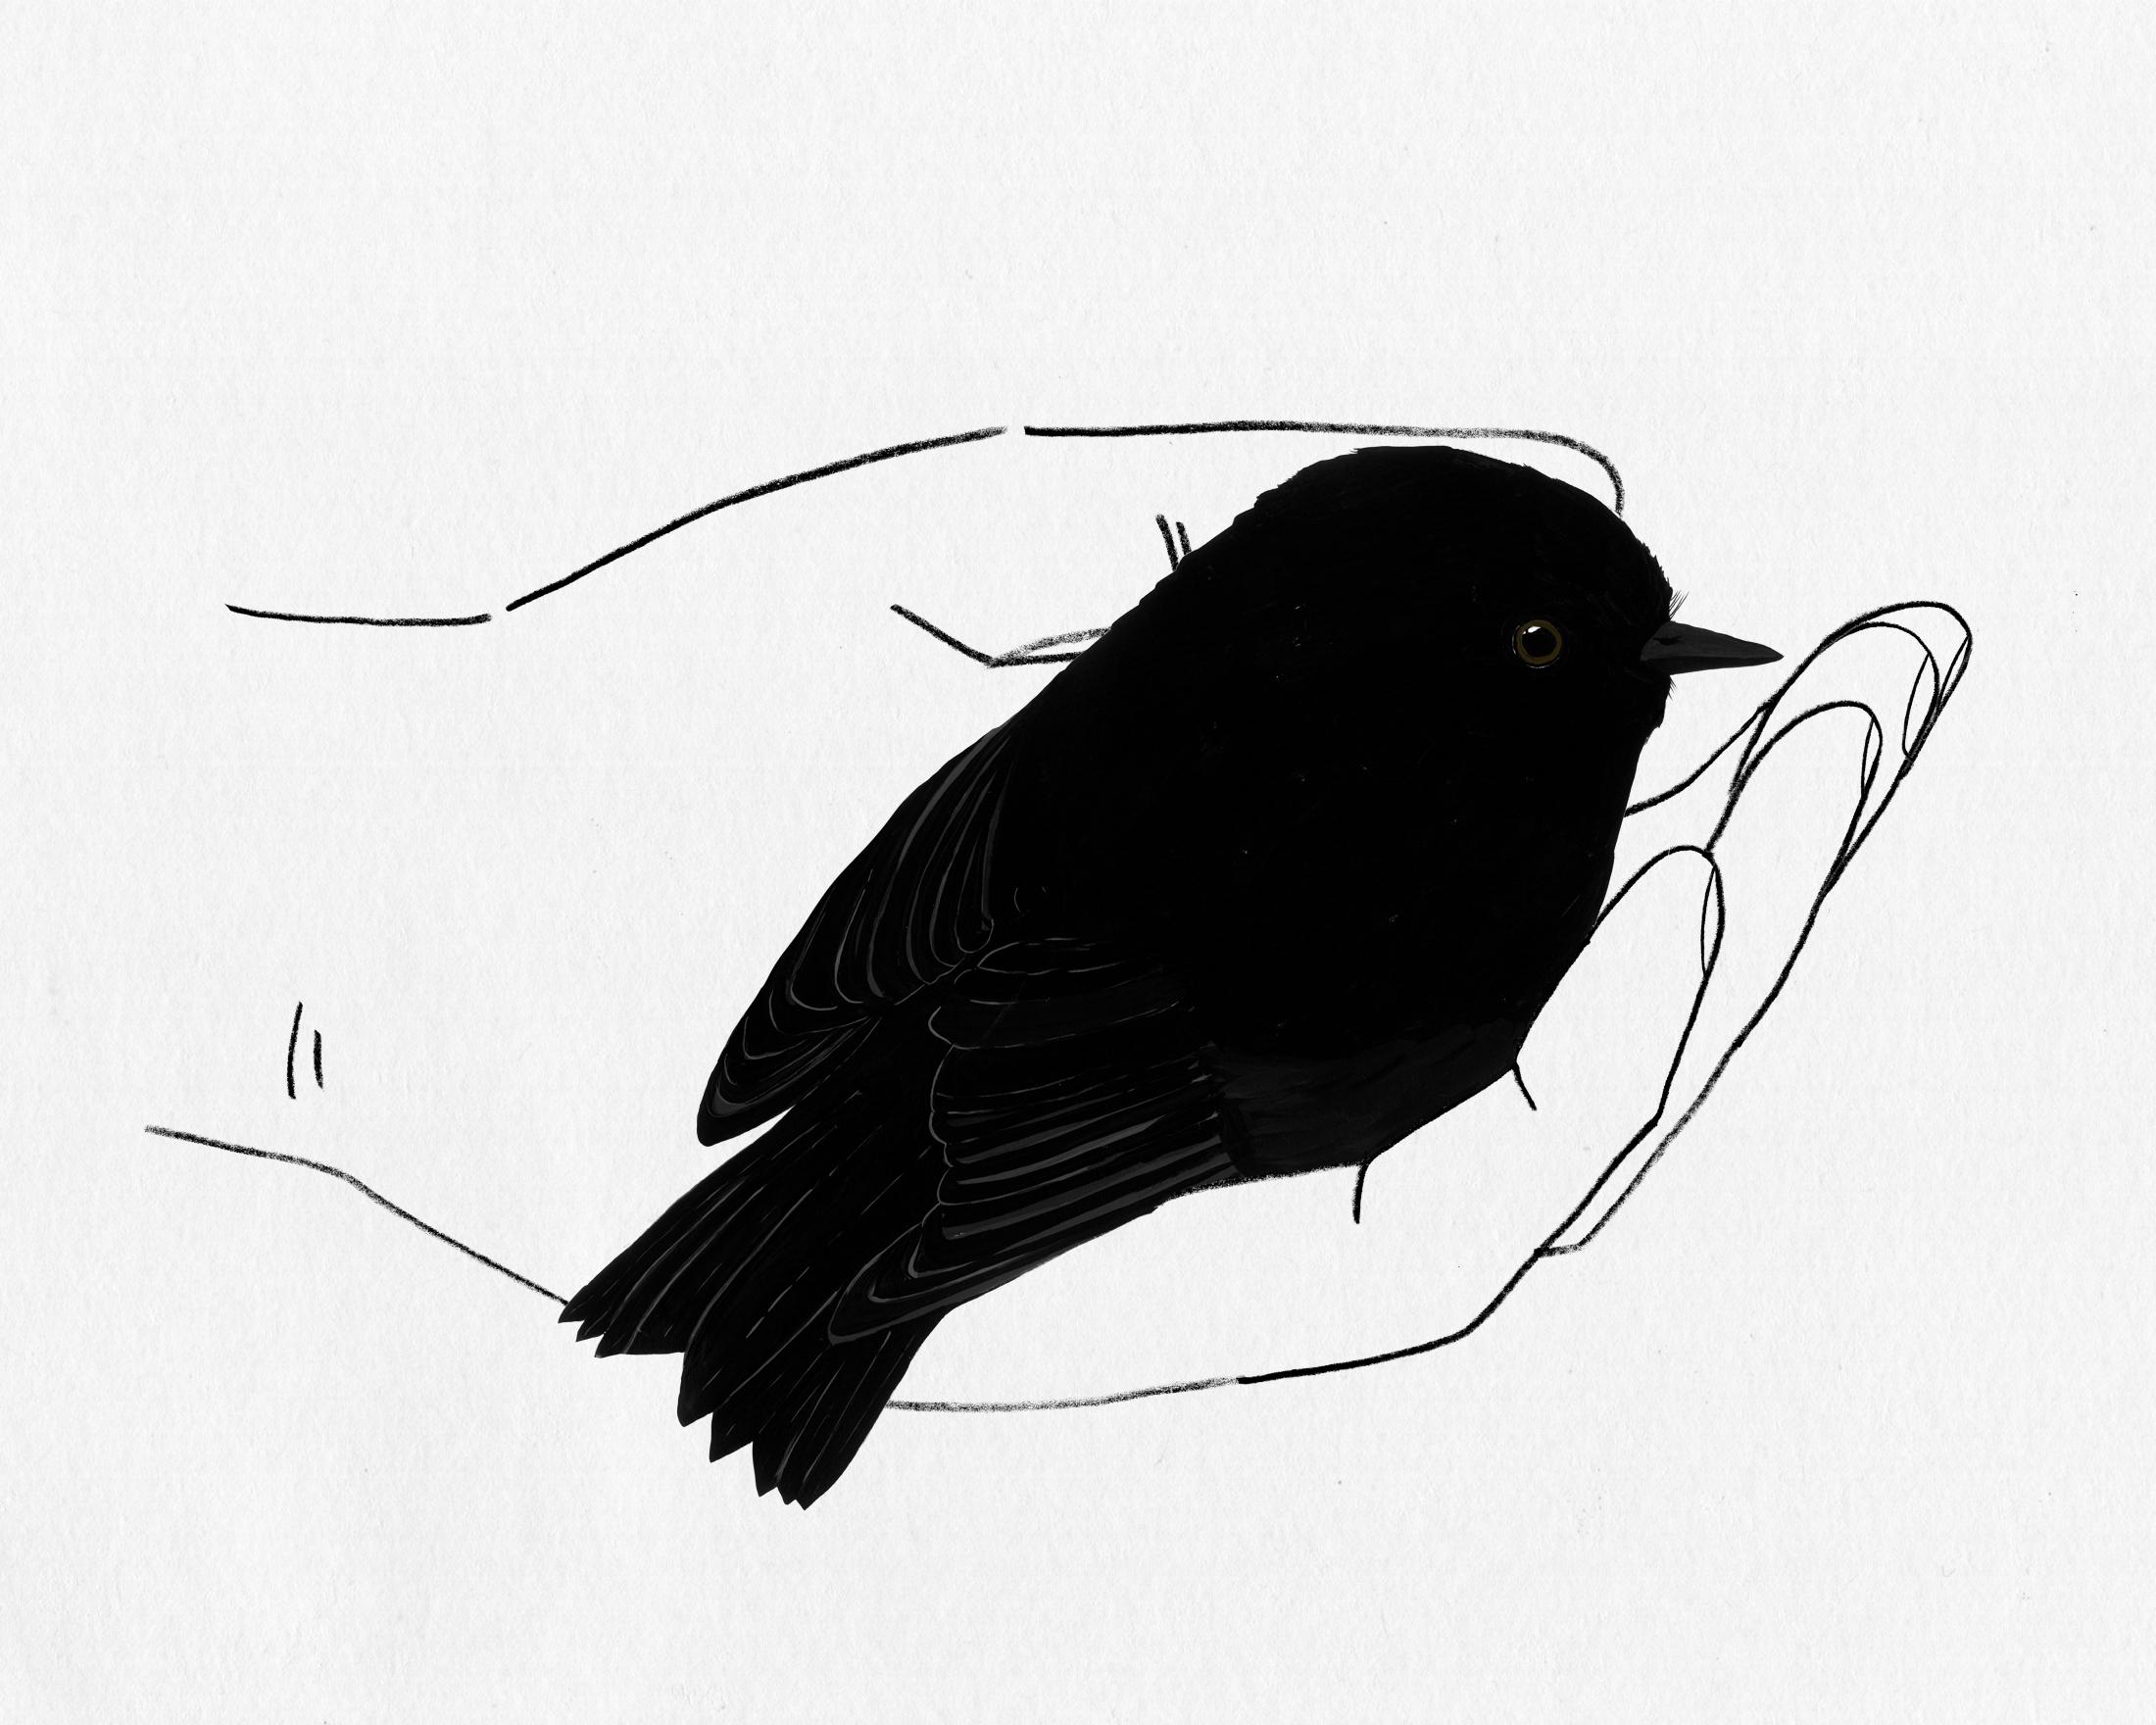 bird in hand series - black robin